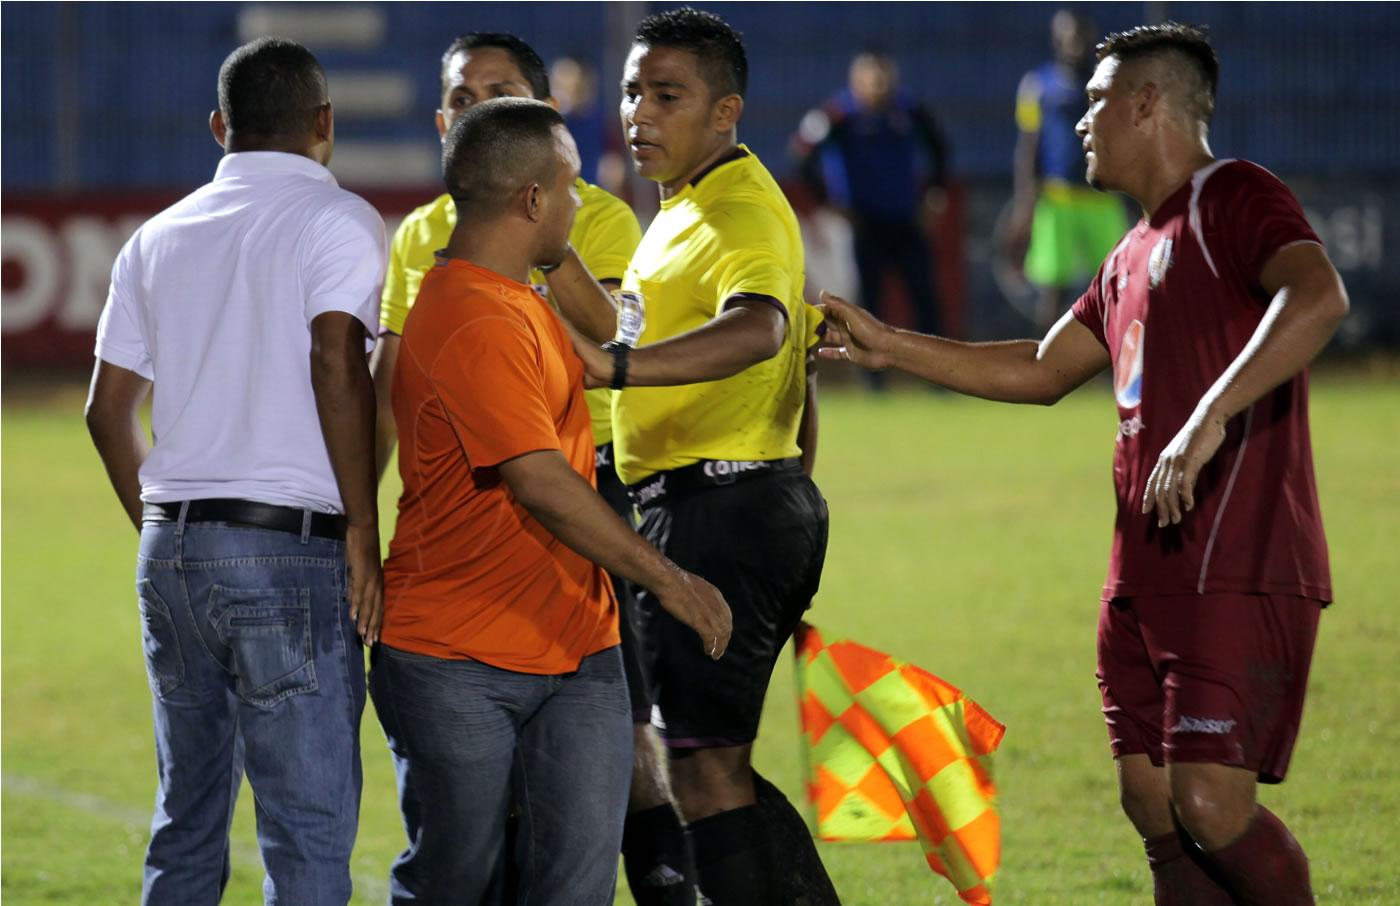 Asistente del Villanueva escupe a árbitro